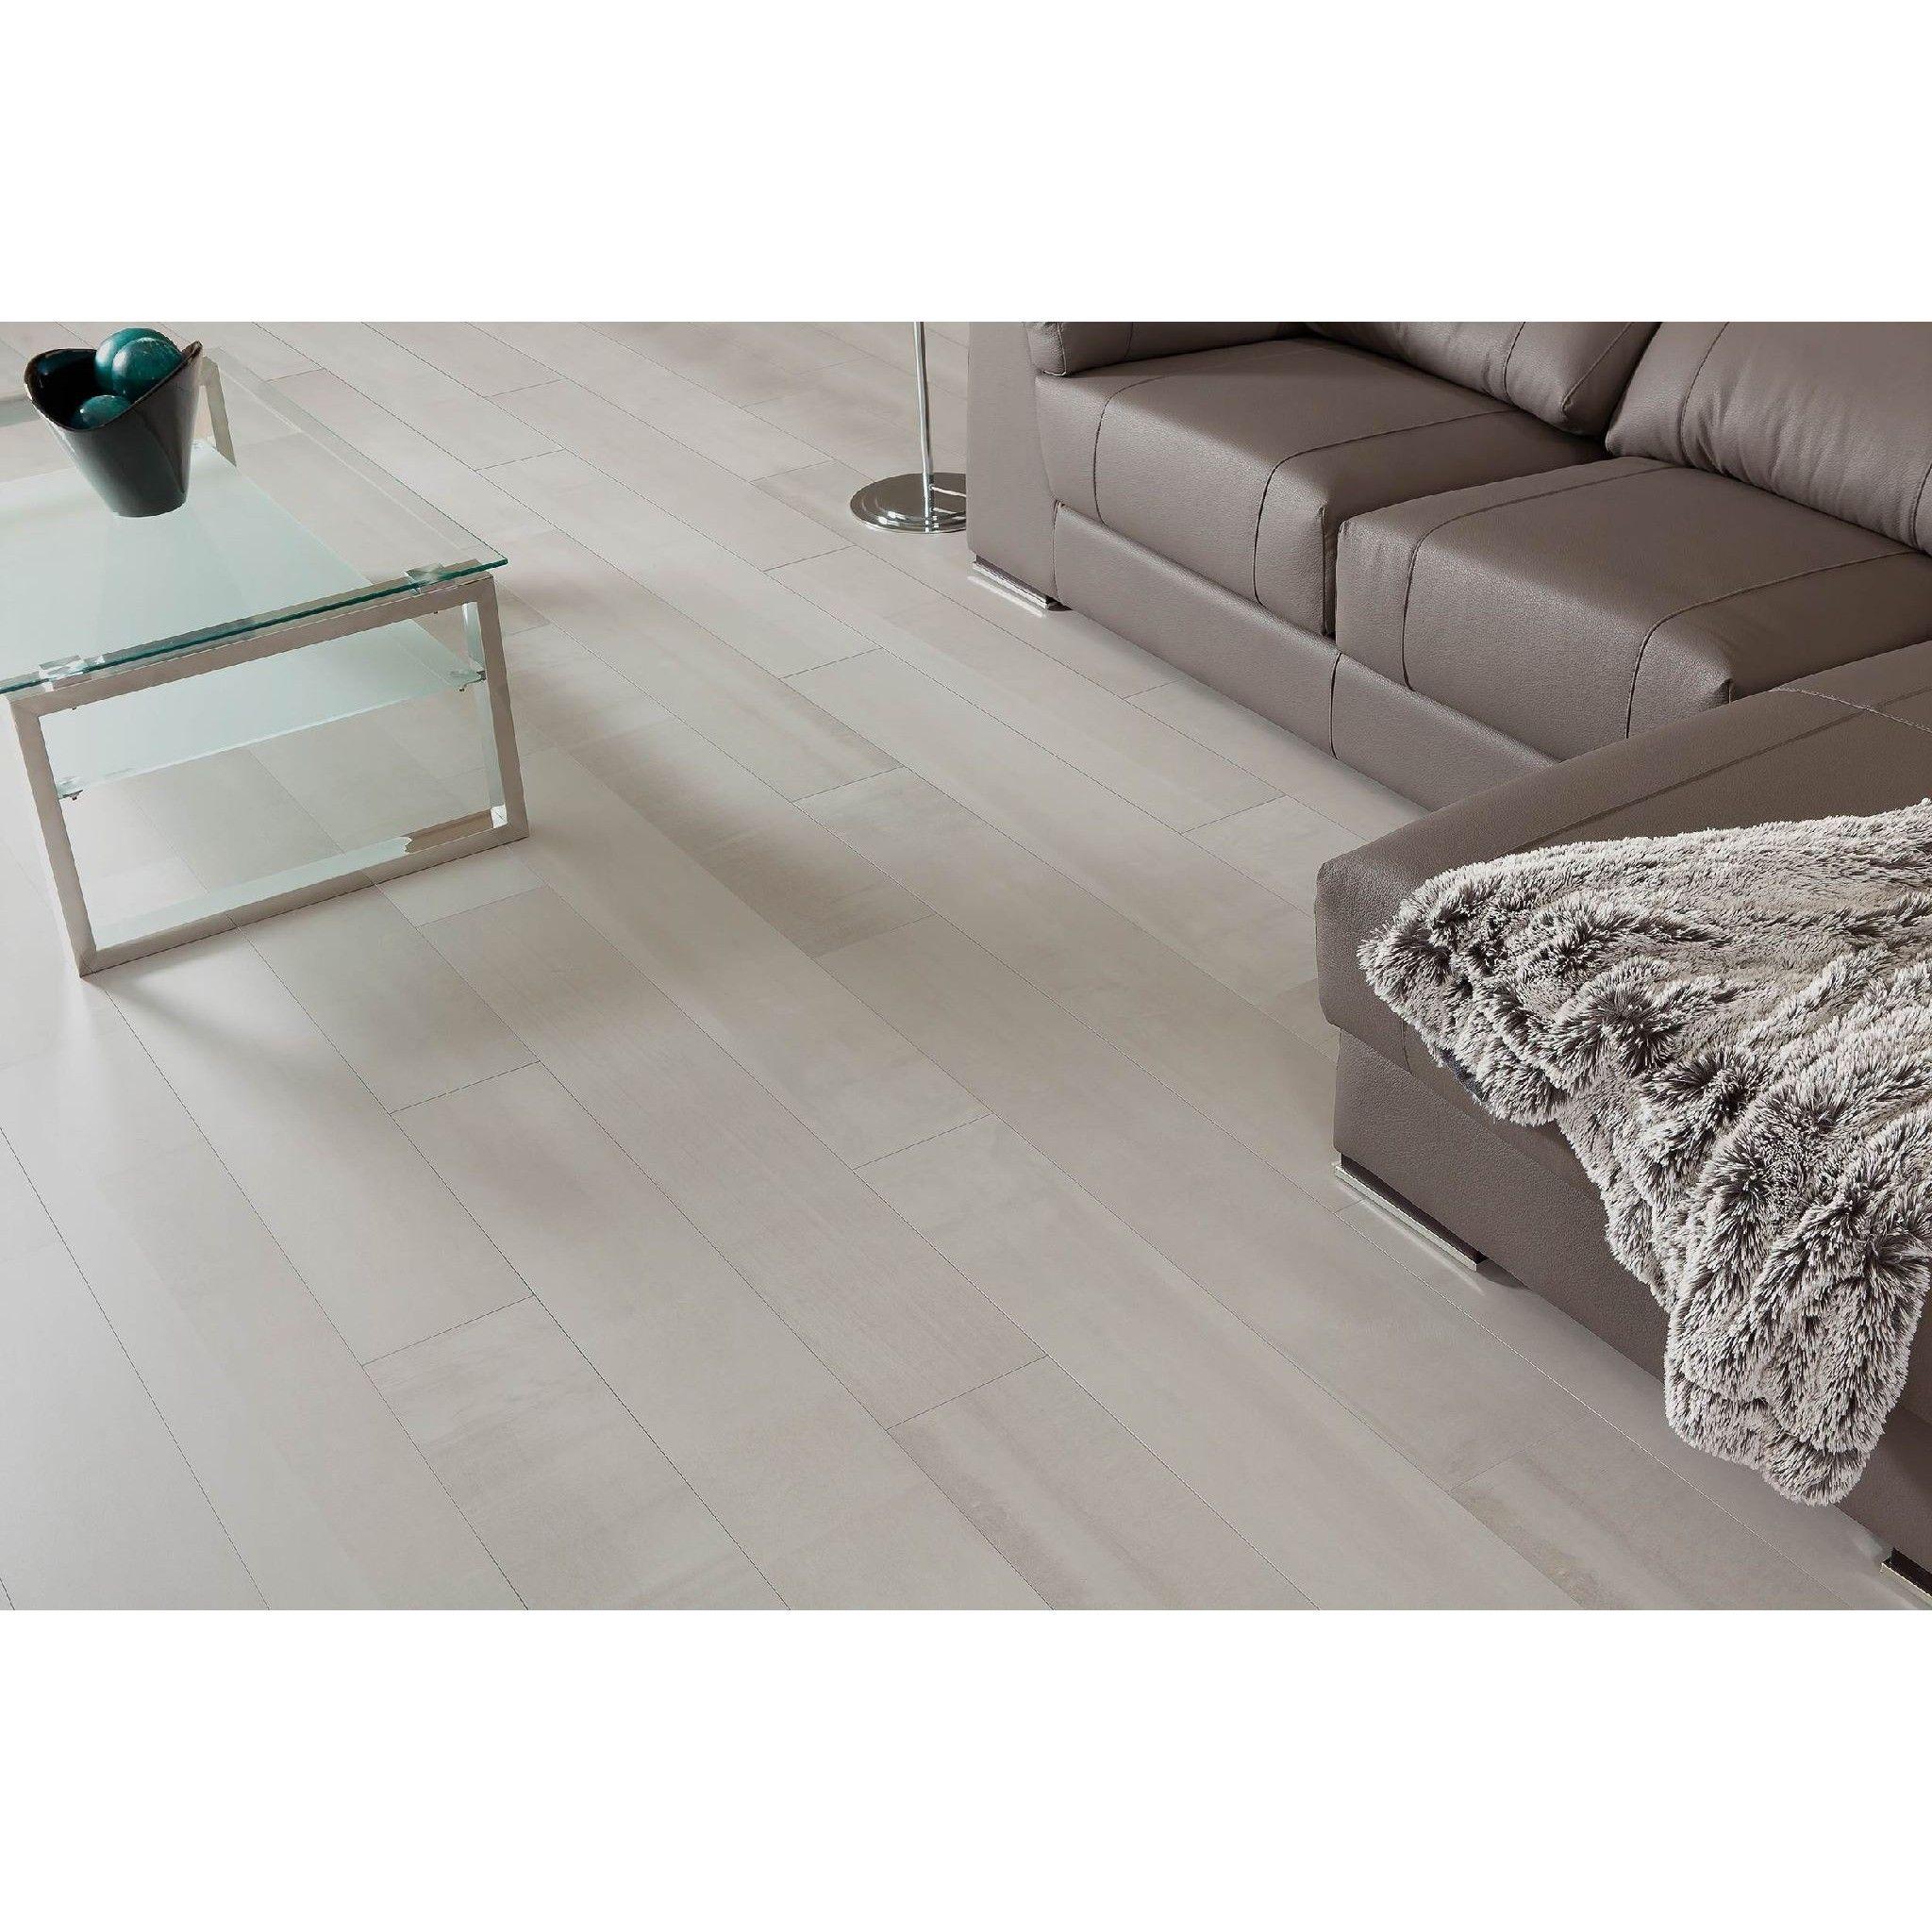 Saloni Abstract Ceniza 8x48 Porcelain Tile | Porcelain tile ...